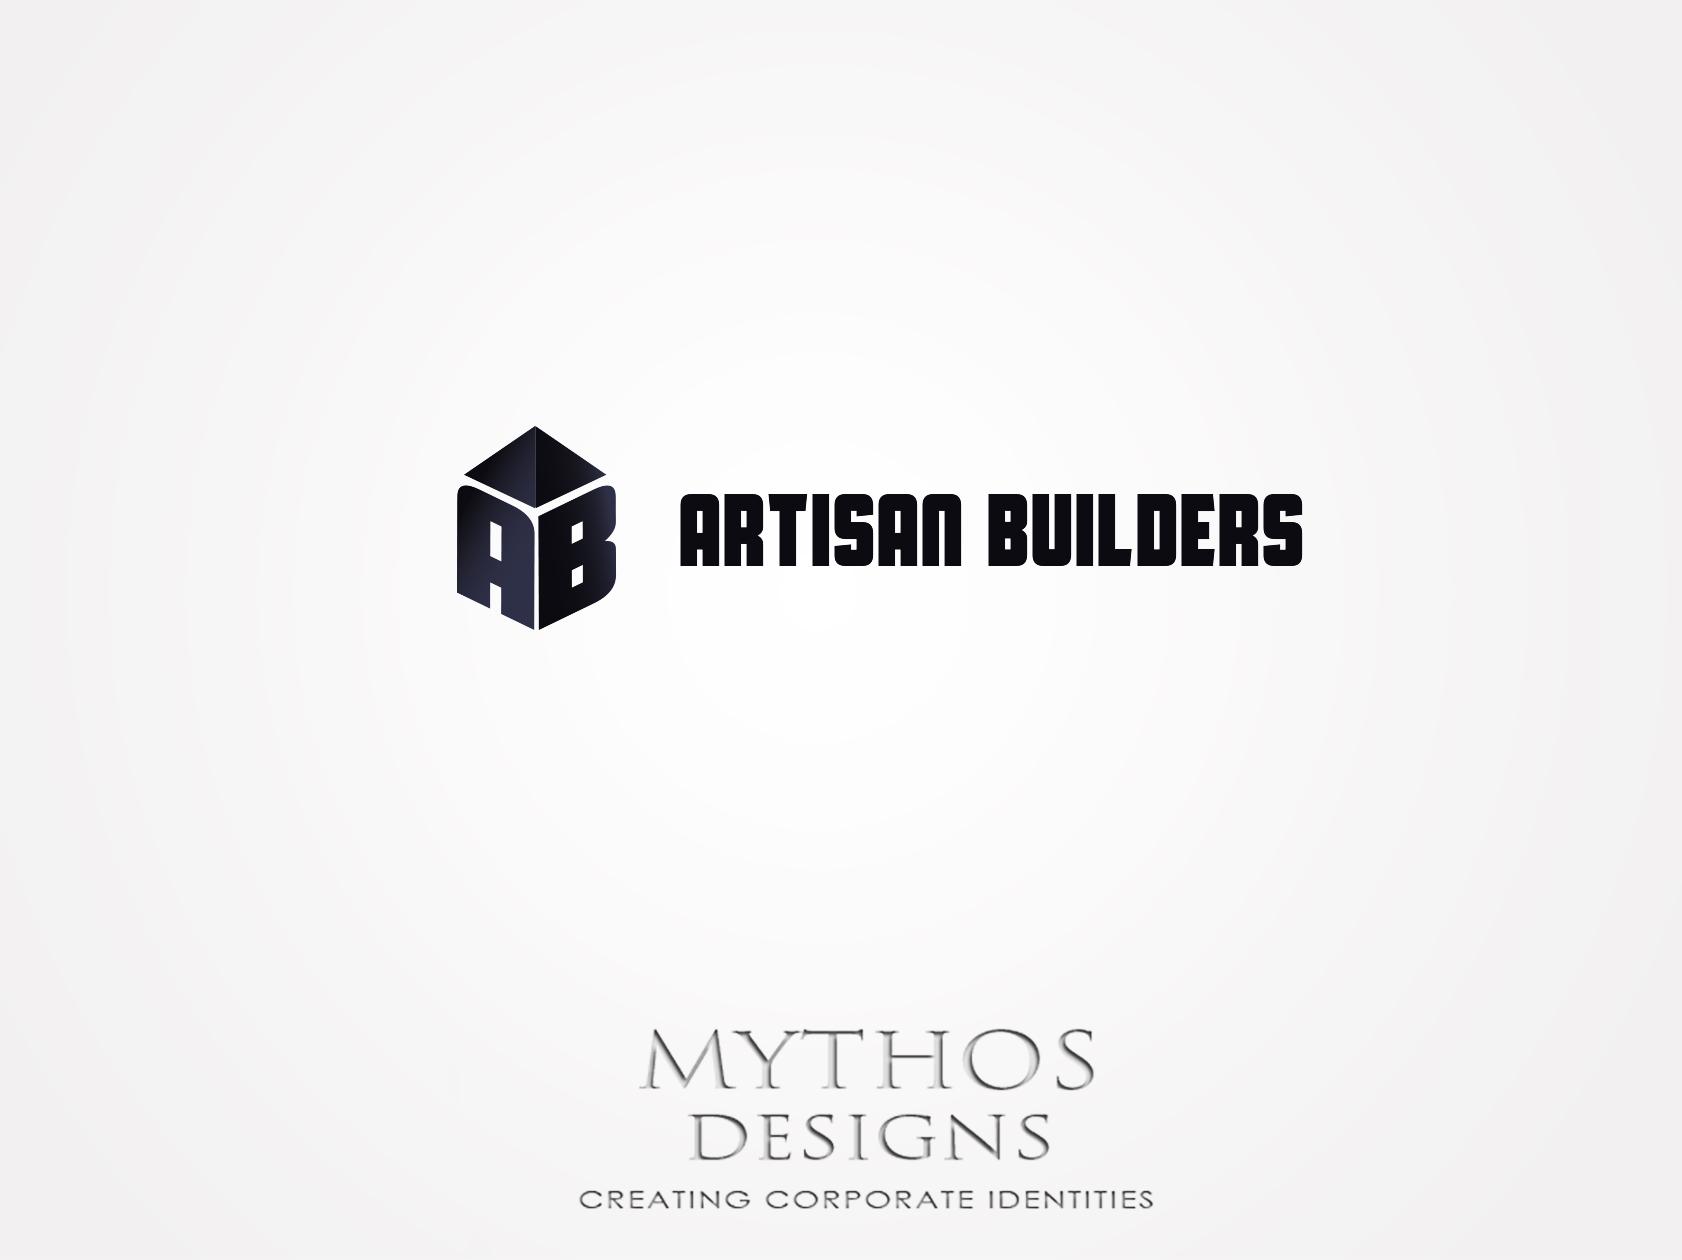 Logo Design by Mythos Designs - Entry No. 45 in the Logo Design Contest Captivating Logo Design for Artisan Builders.